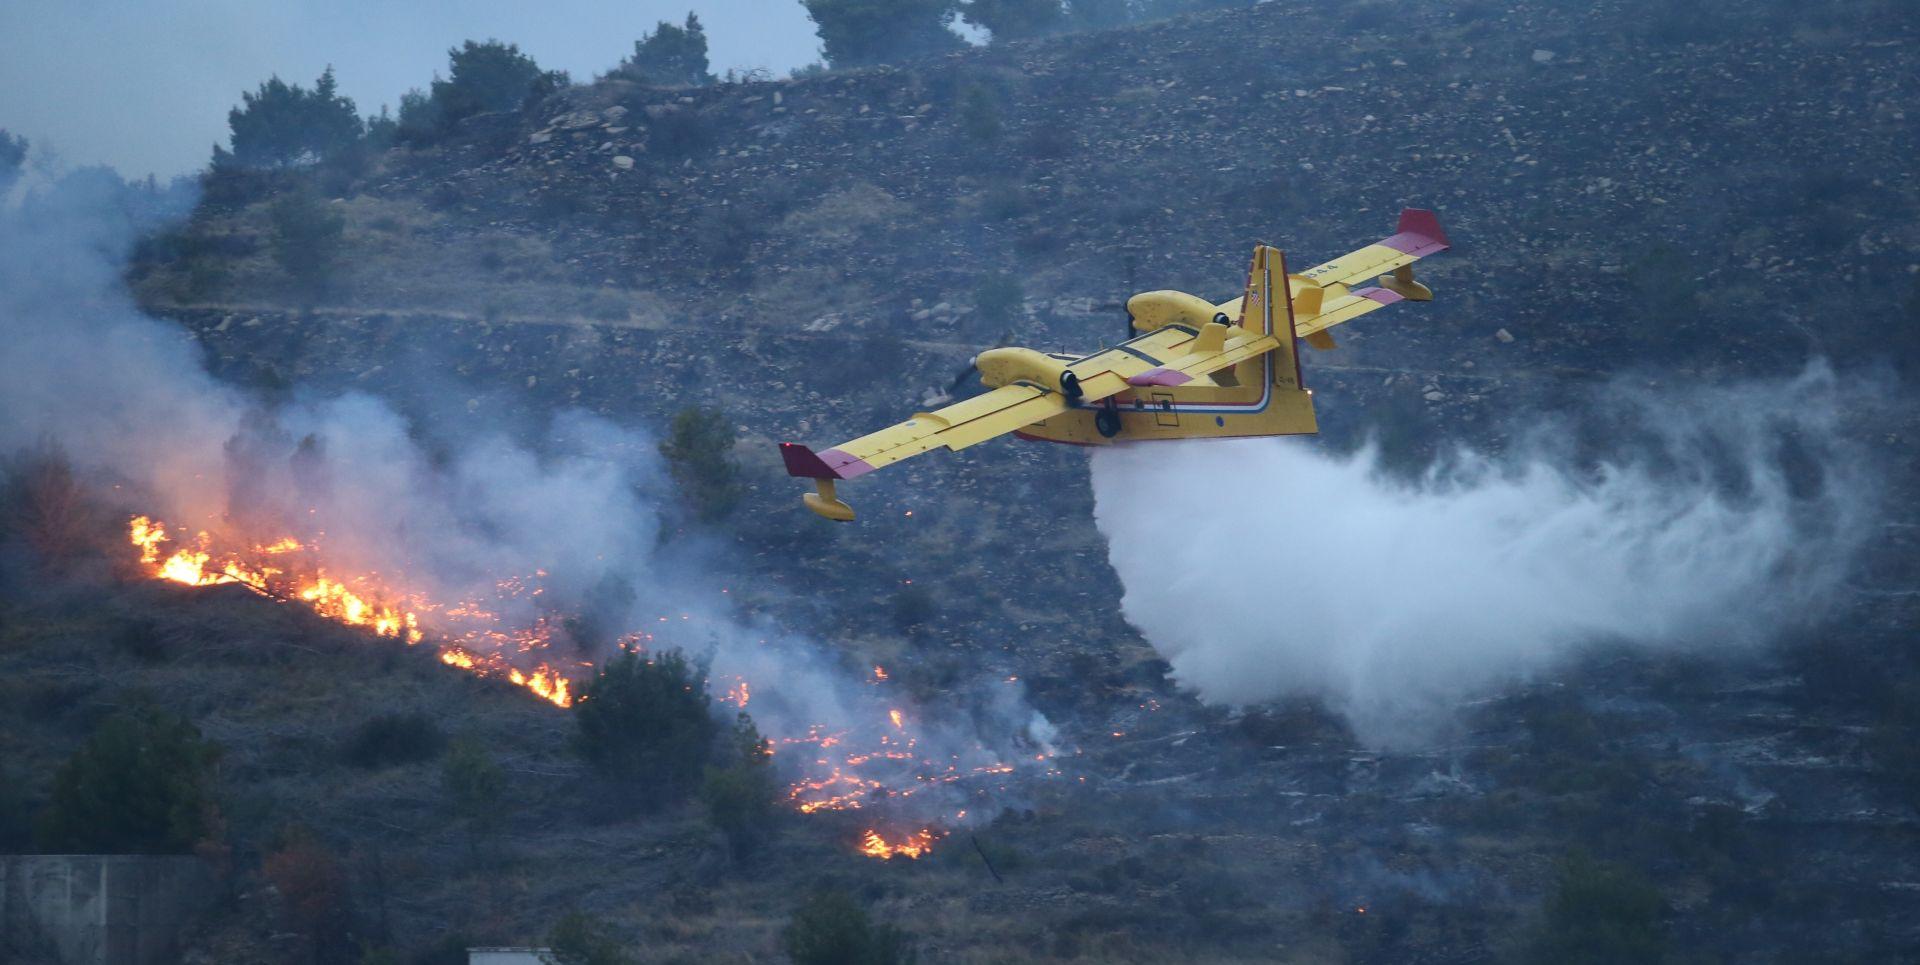 Požar u Žrnovnici se proširio, gasili kanader i air traktor